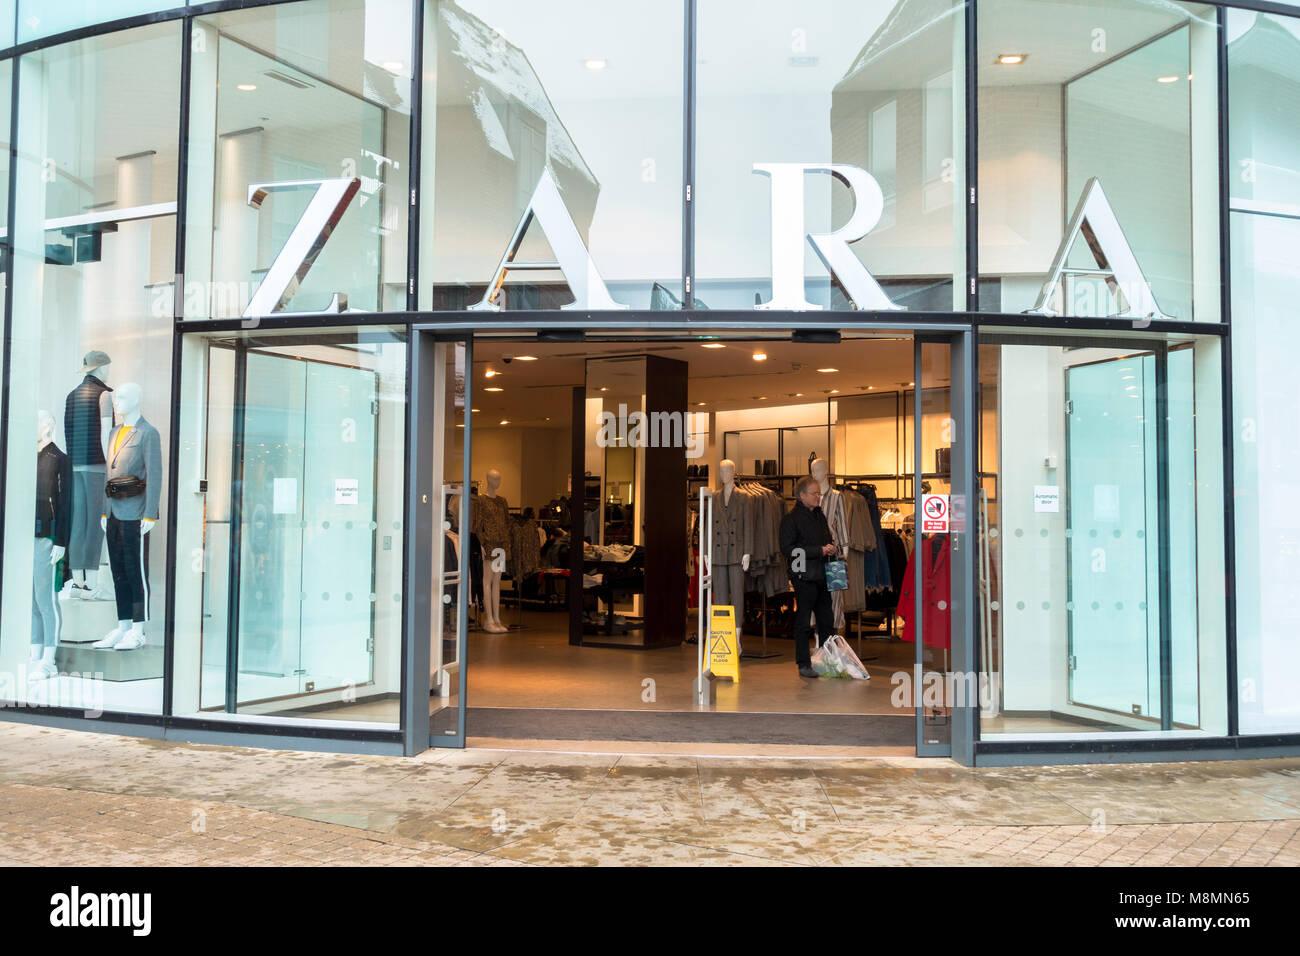 zara retail Zara is one of the world's largest international fashion companies  it belongs to inditex, the world's biggest fashion group.